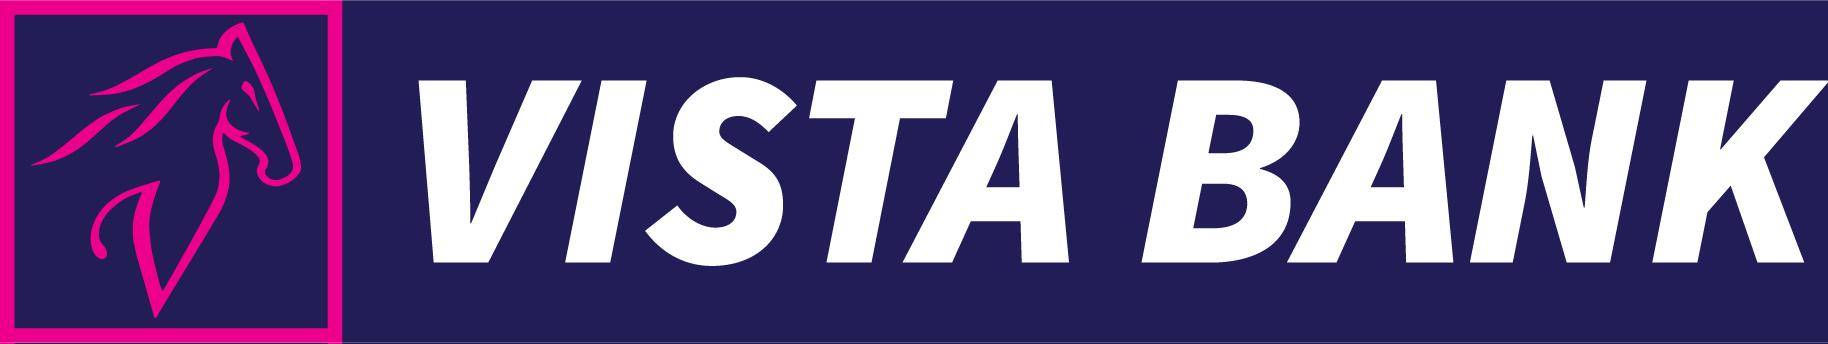 logo.jpg#asset:1018